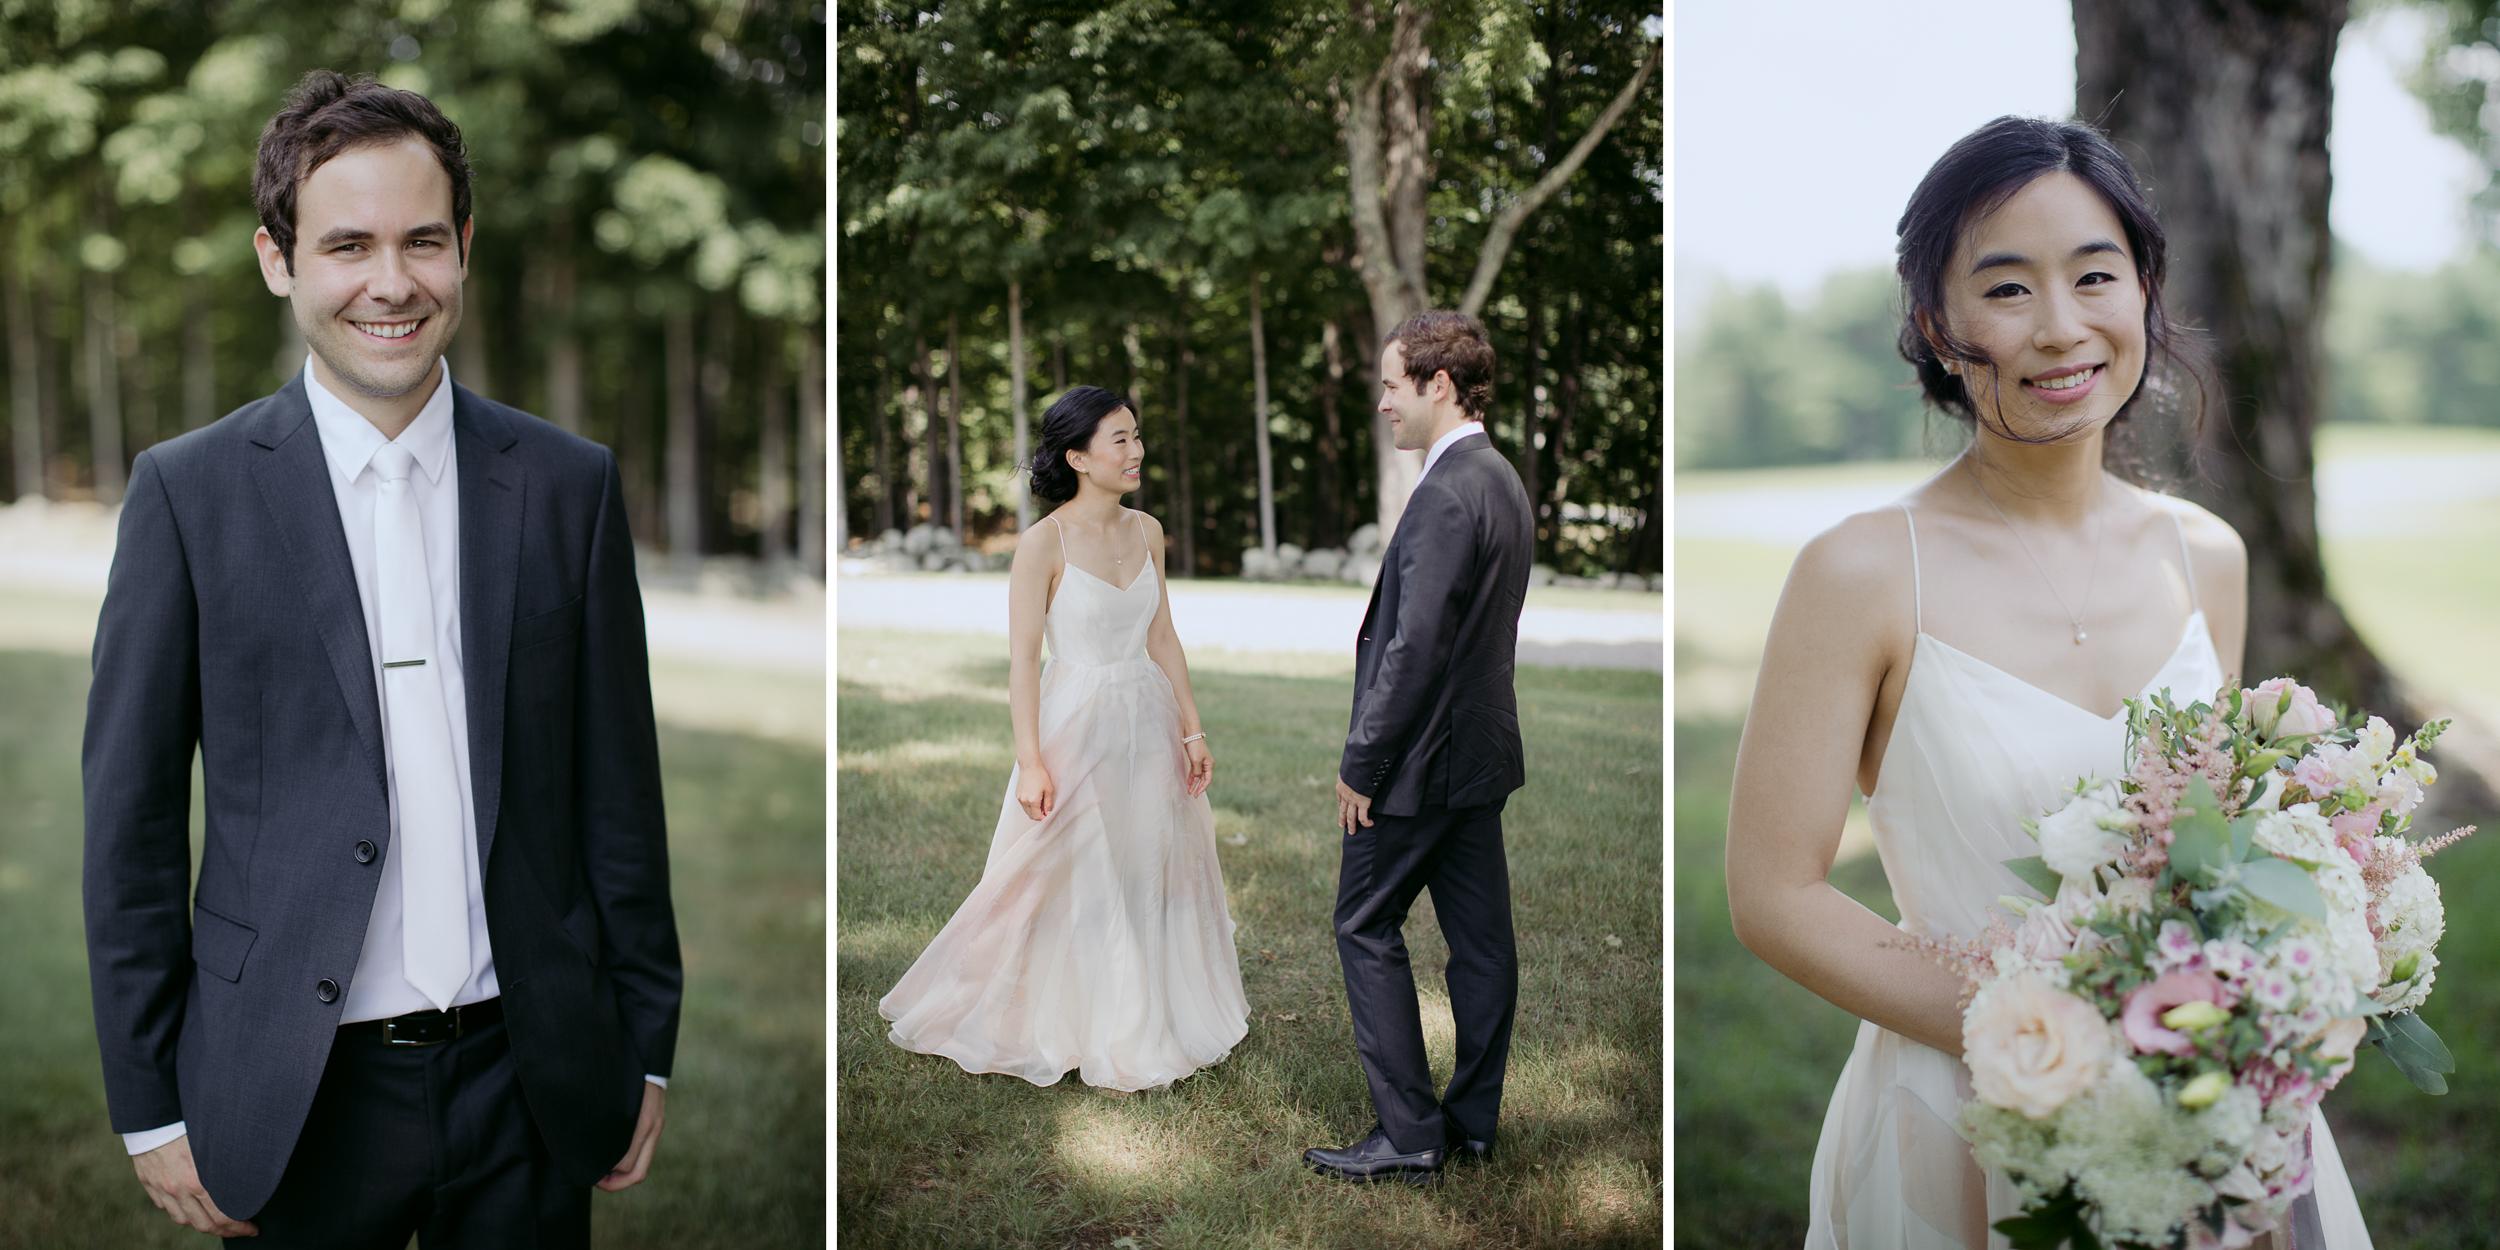 william_allen_farm_wedding_pownal_maine_ilkatayler-5.jpg